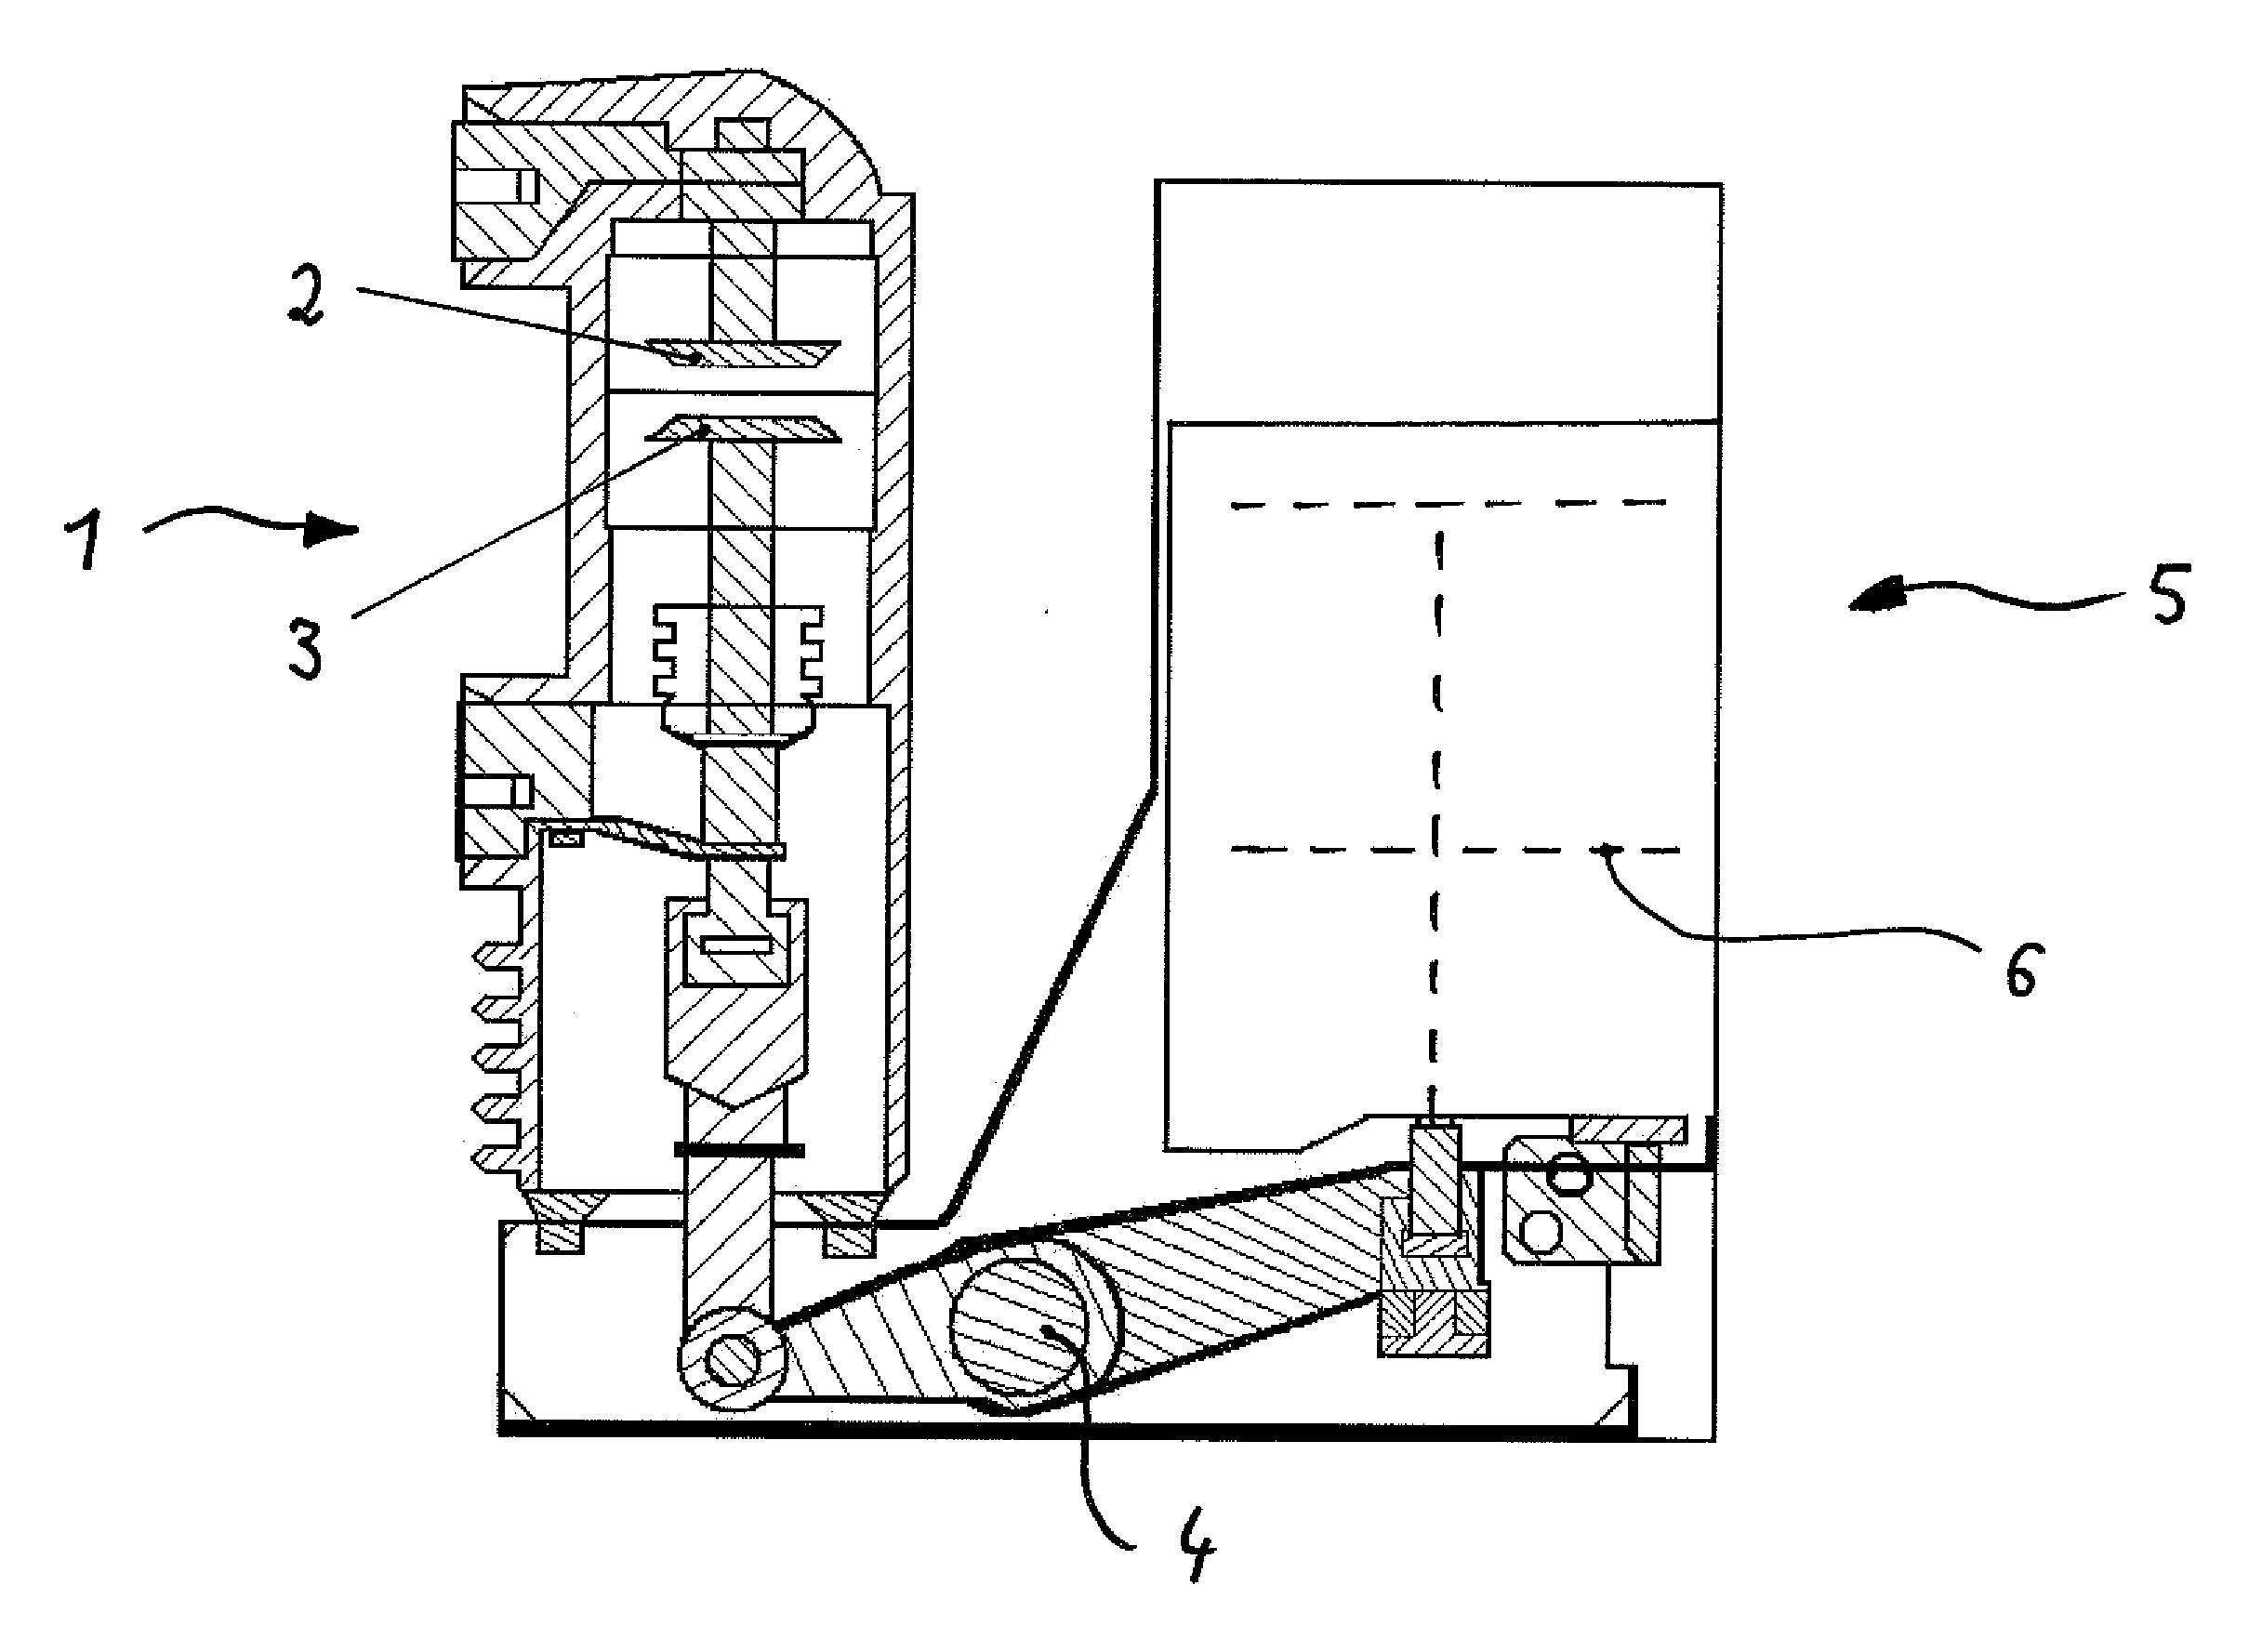 patent us20120286905 - bistable magnetic actuator for a medium voltage circuit breaker